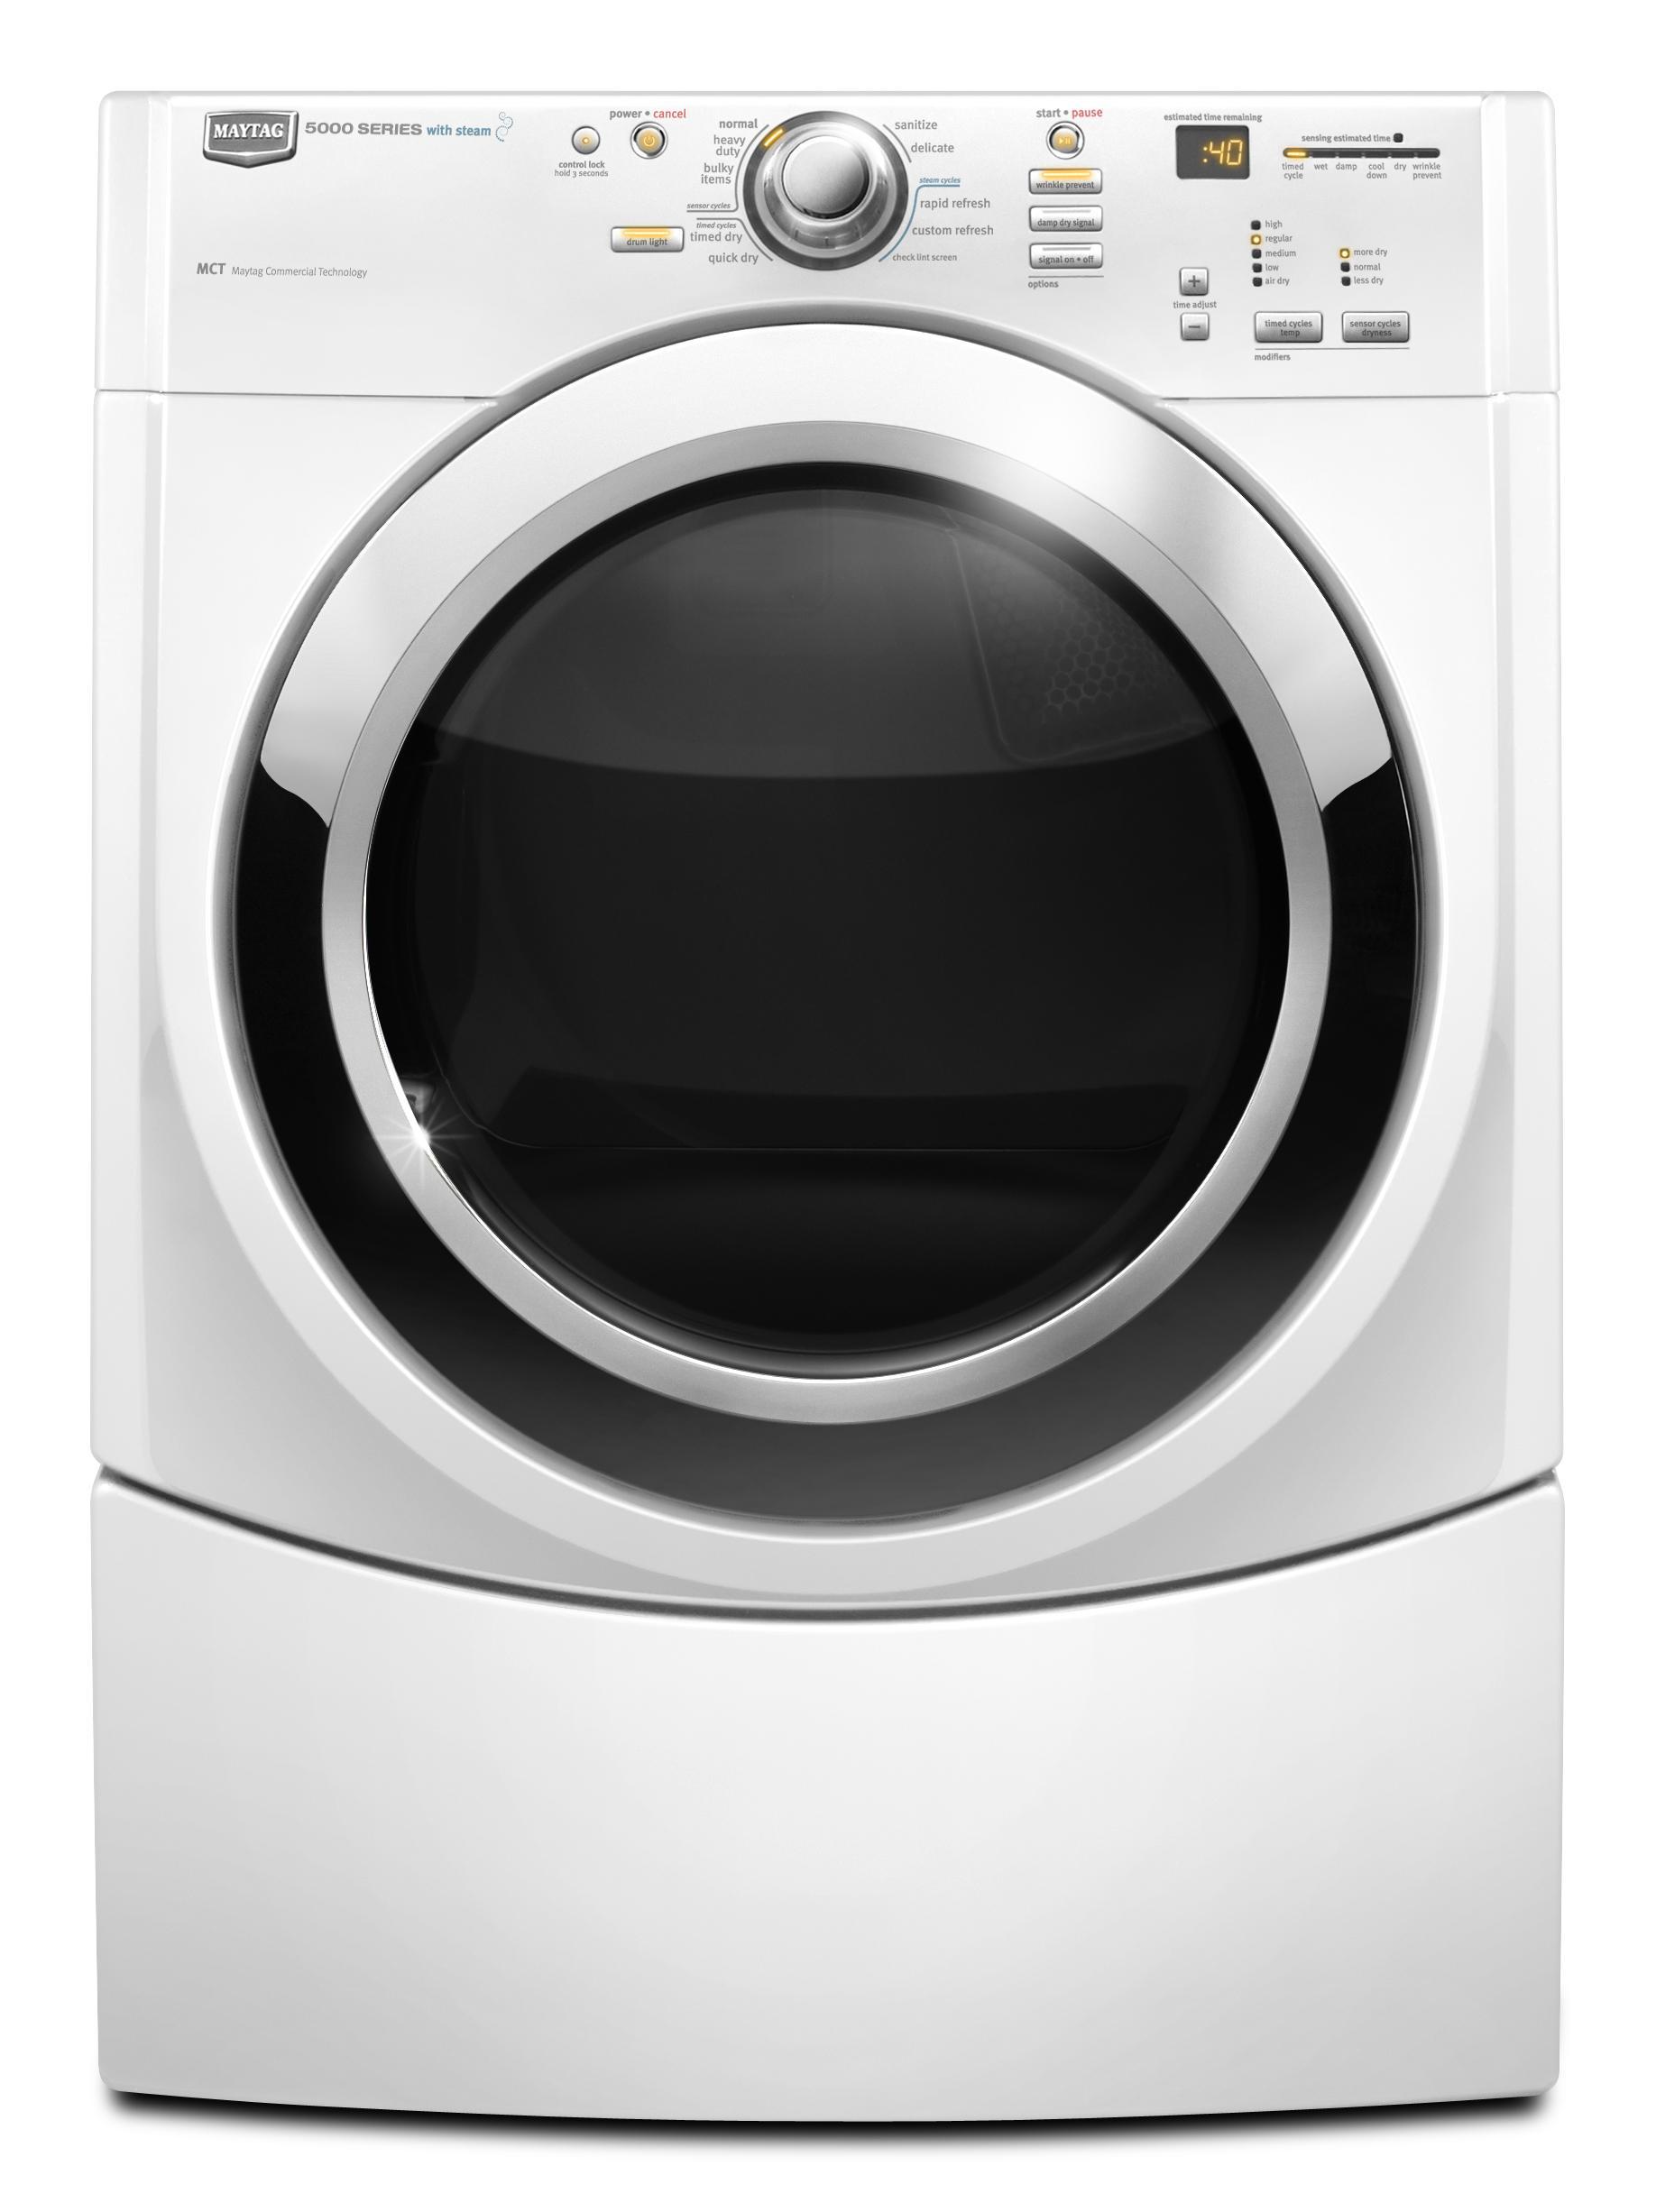 Maytag Mgde500vw7 0 Cu Ft Performance Series Gas Dryer